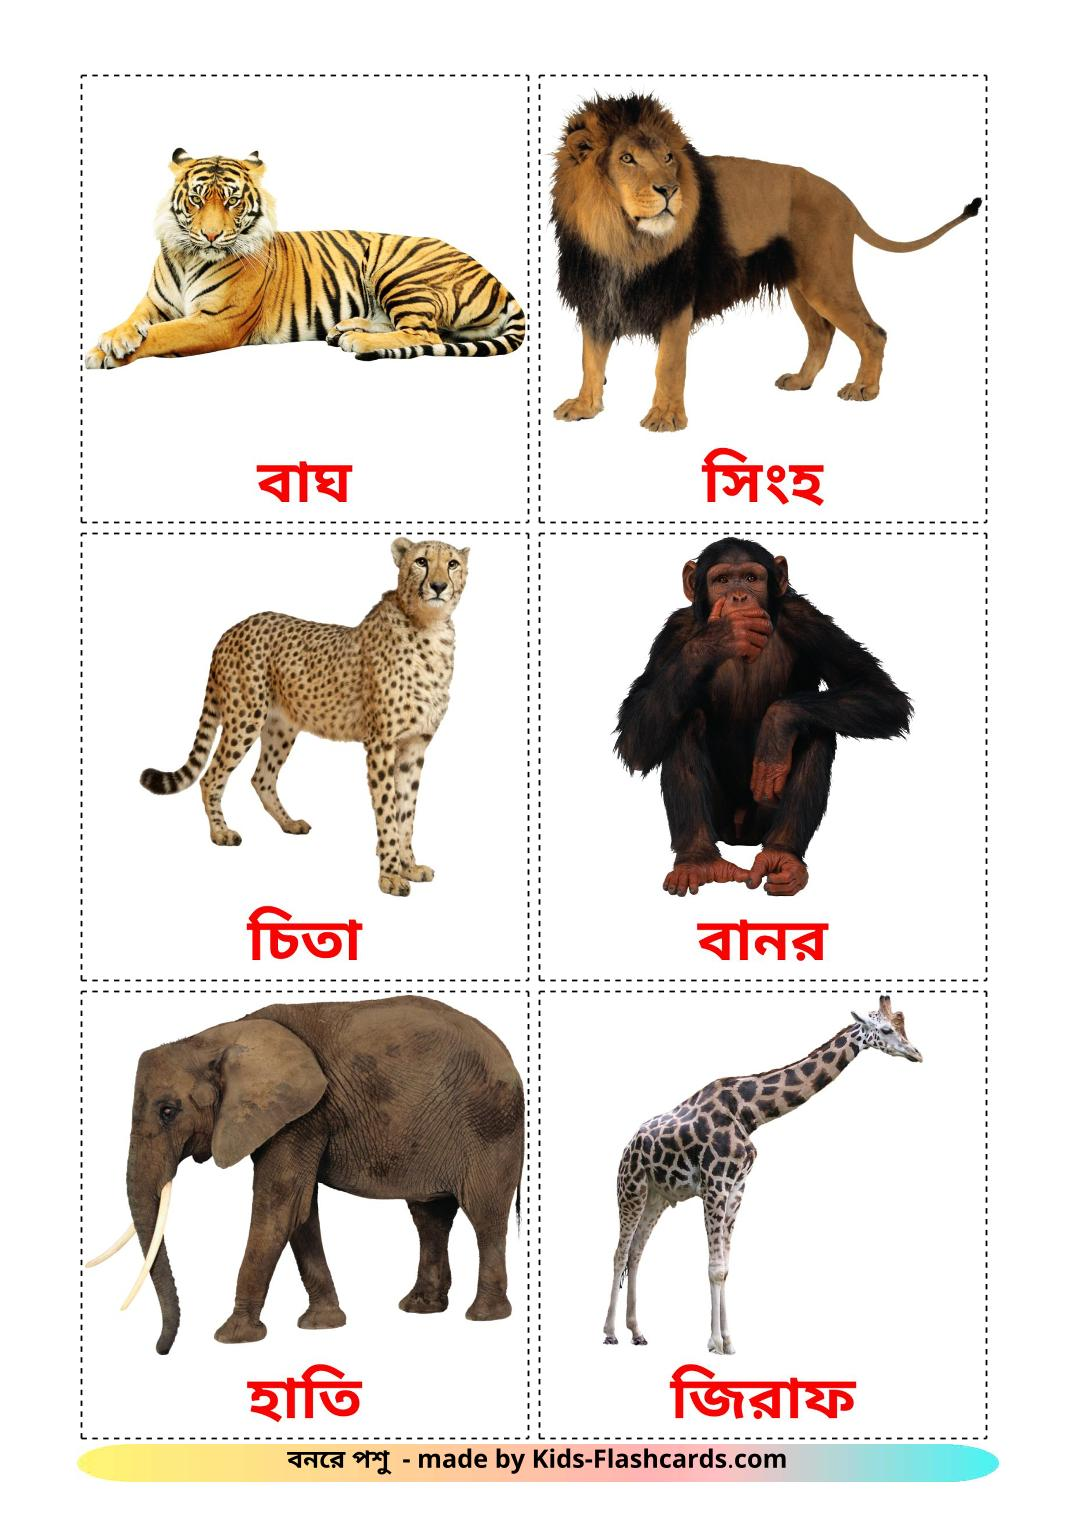 Jungle animals - 21 Free Printable bengali Flashcards